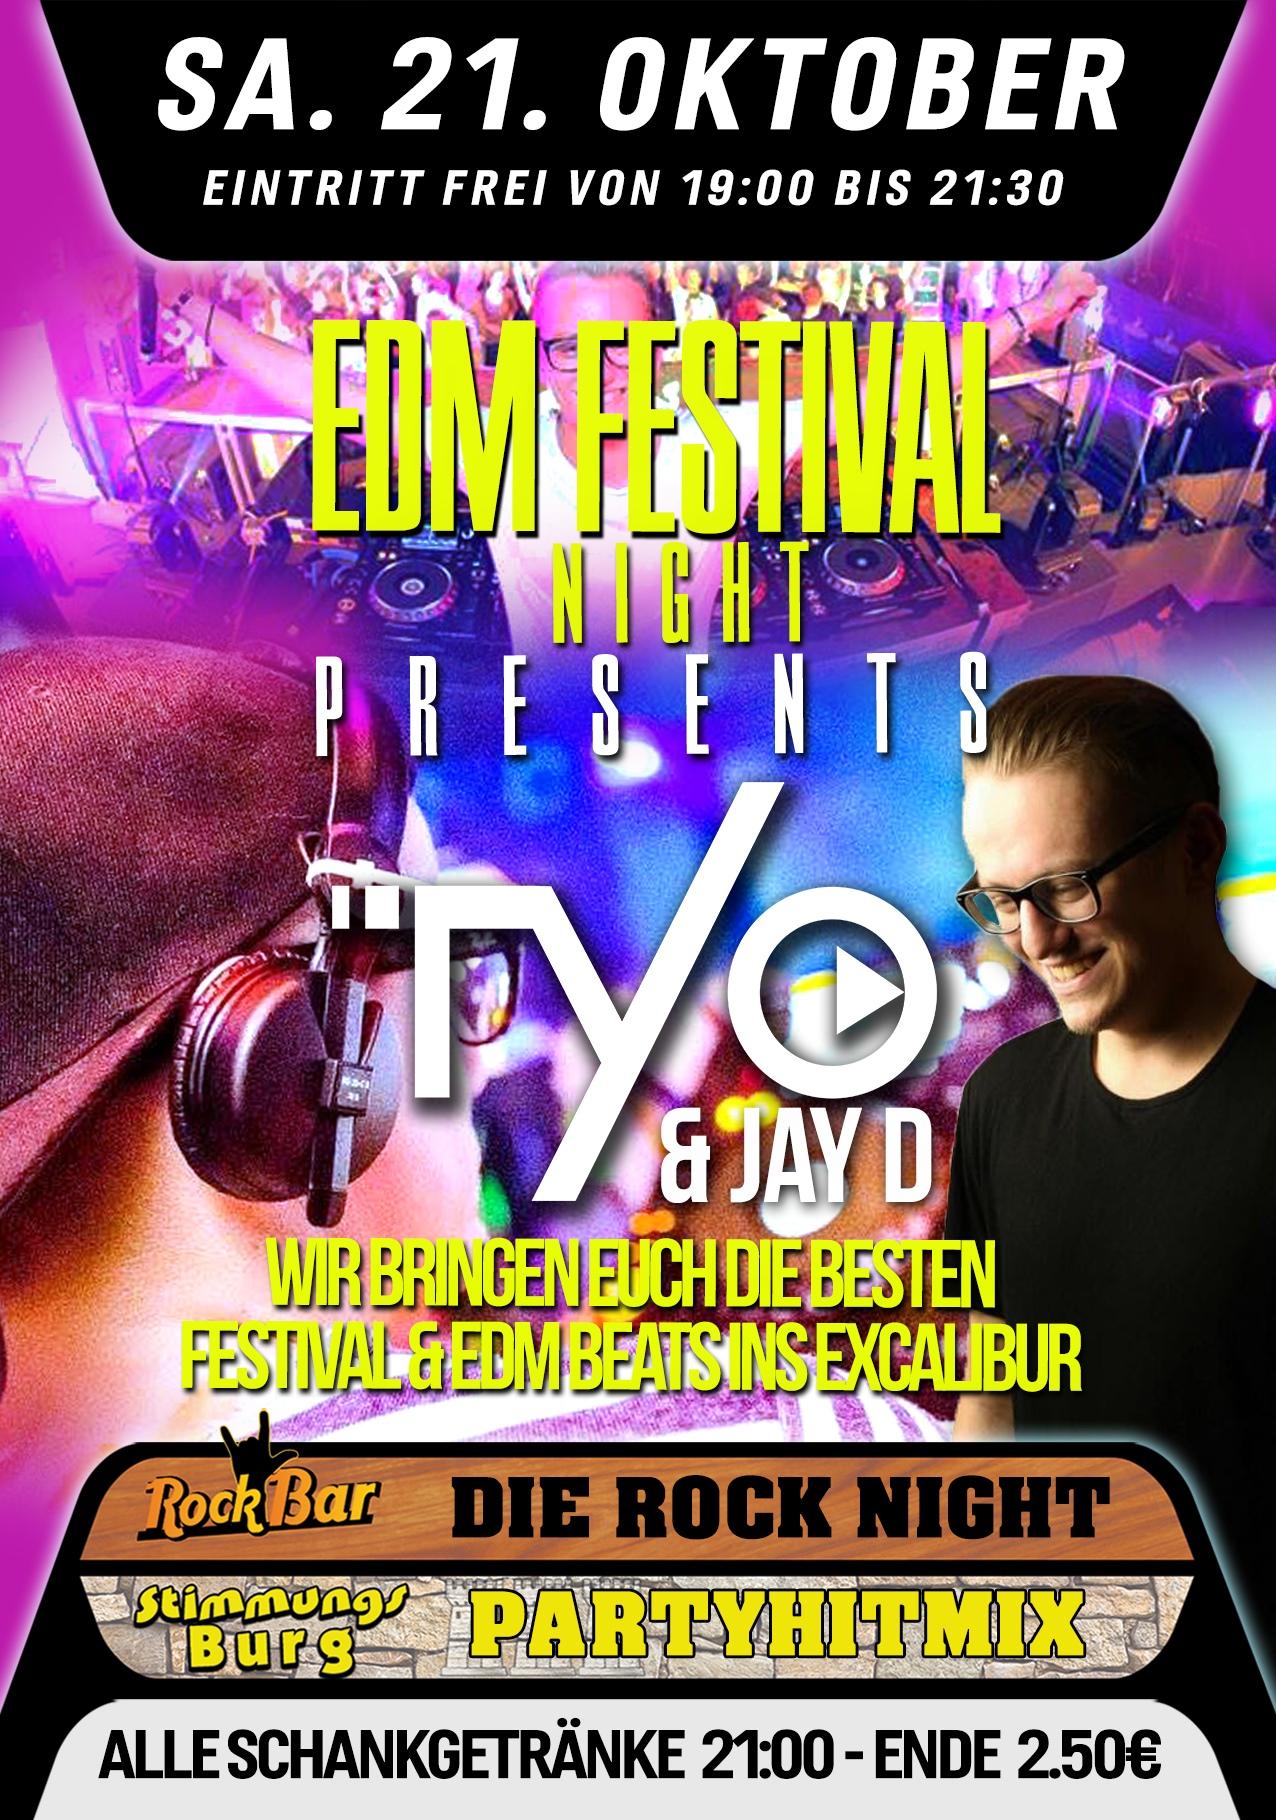 EDM Festival Night mit TYO & JAY D